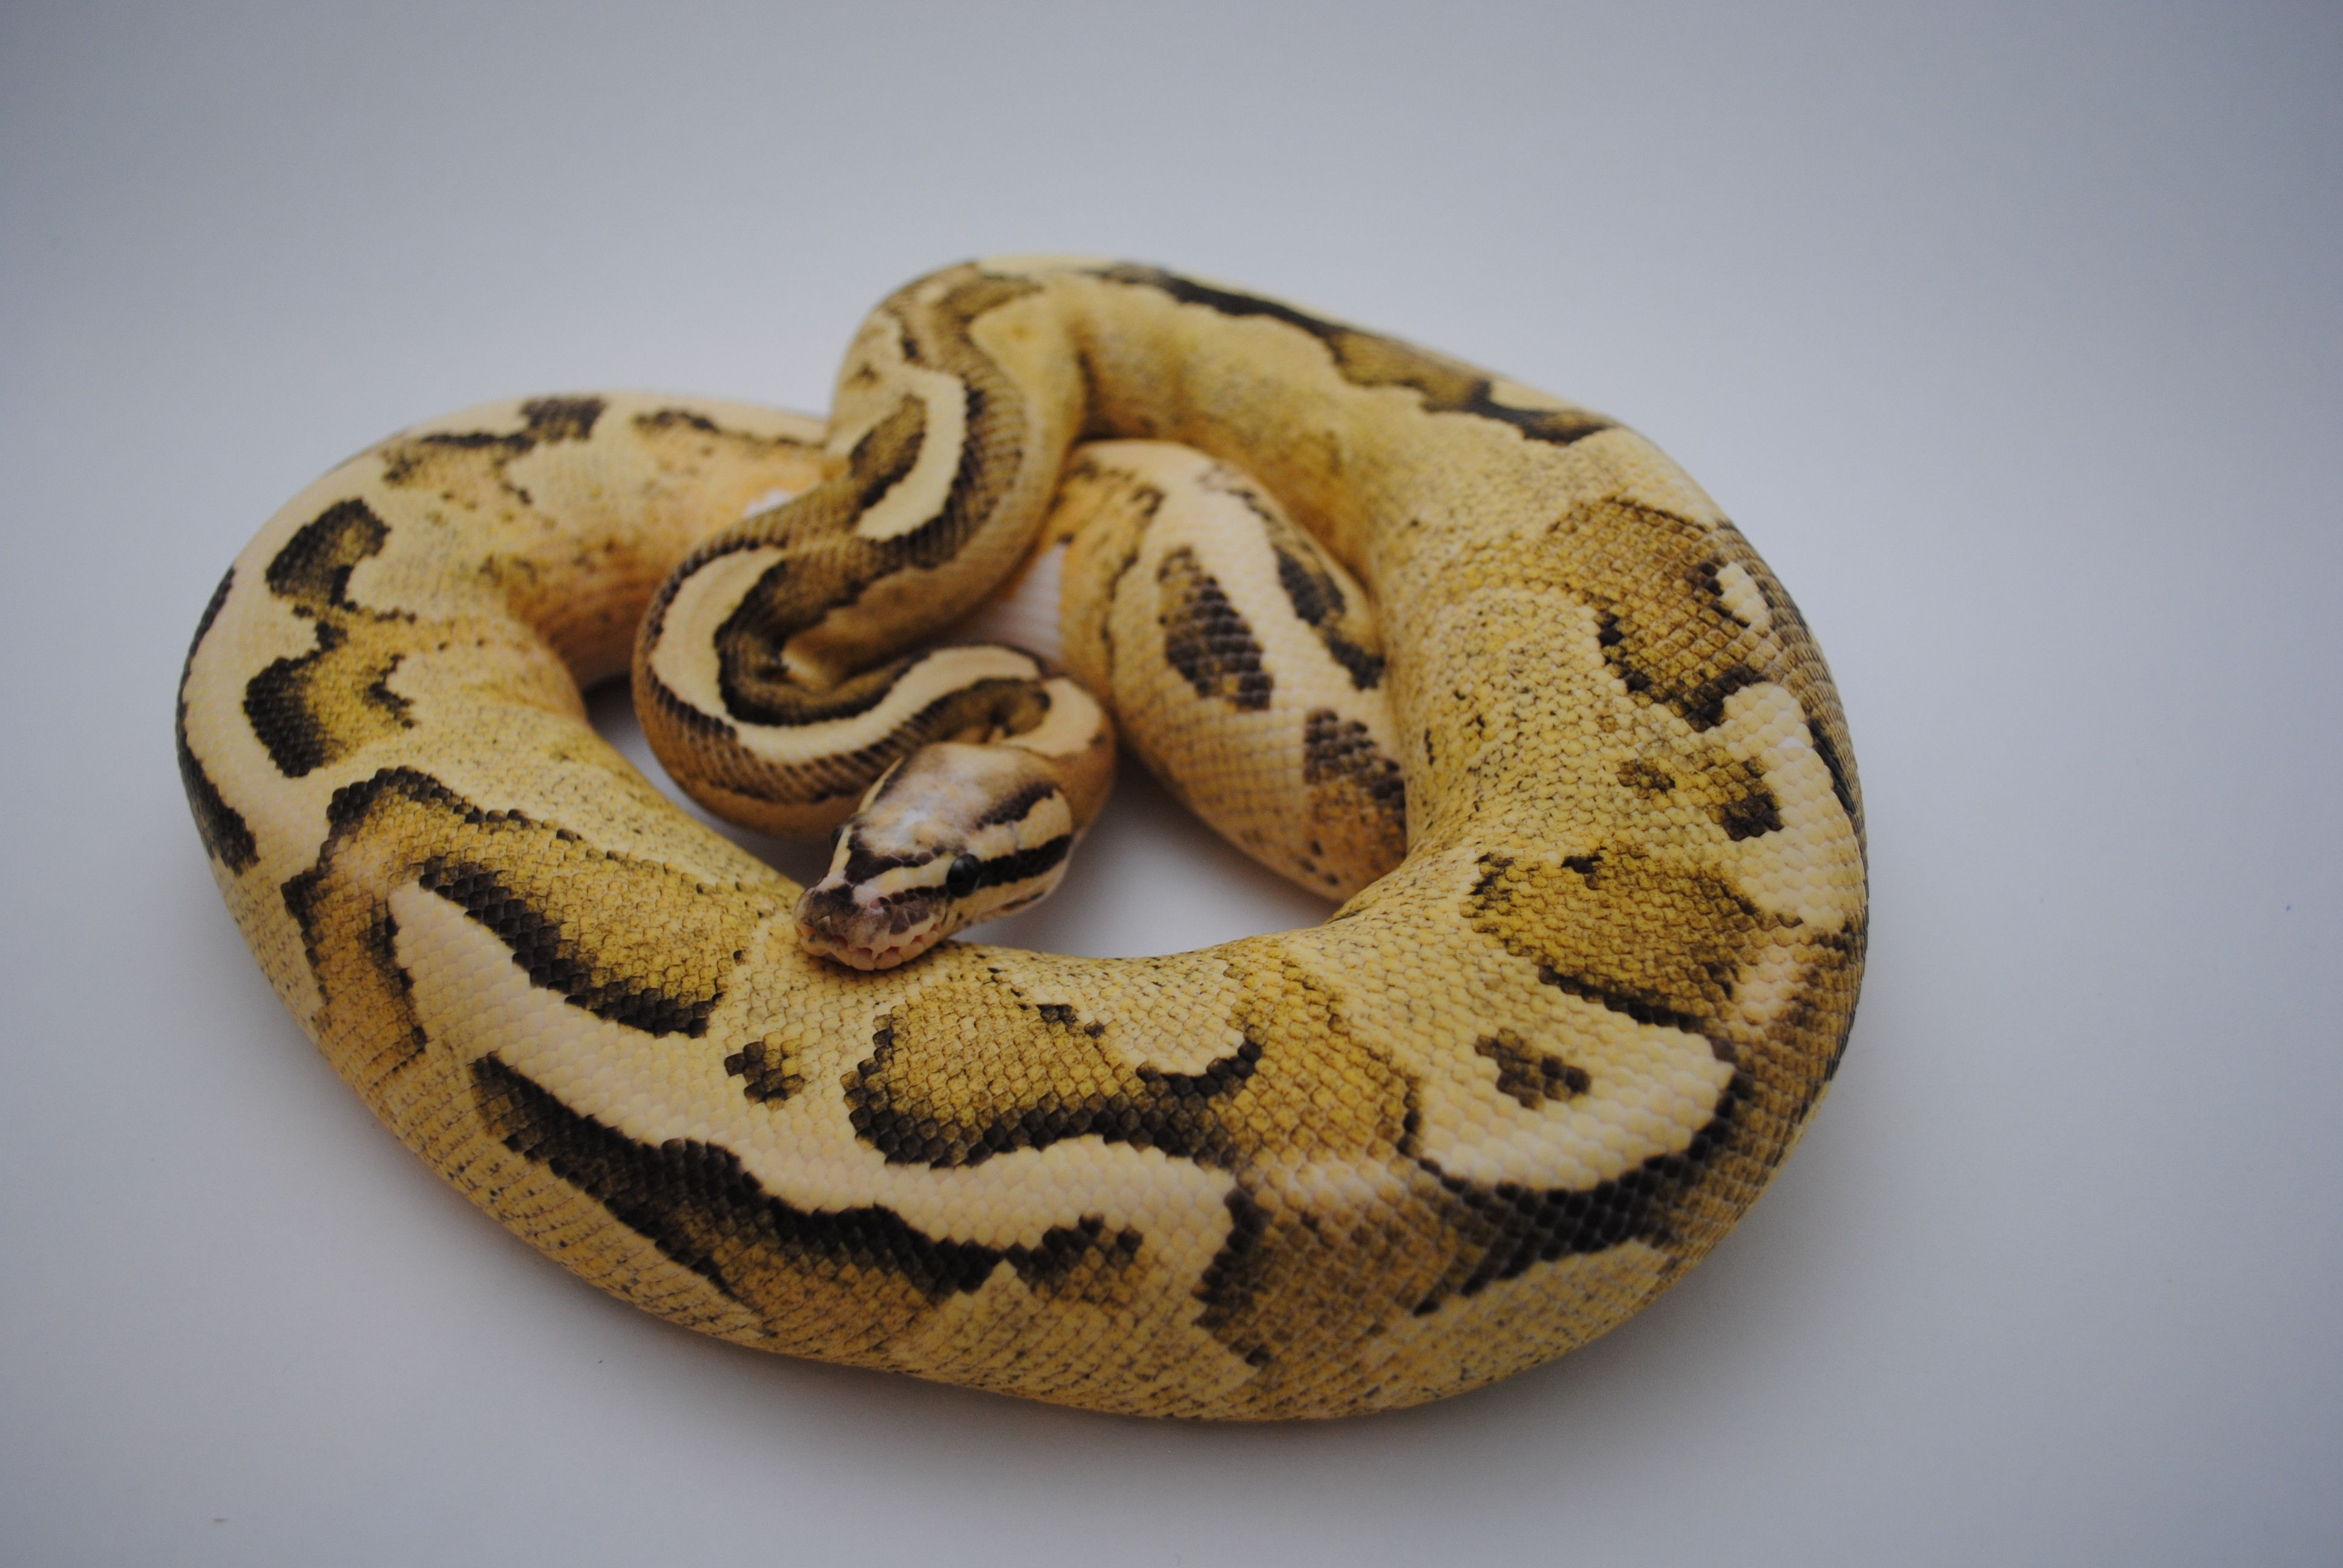 Vanilla Cream Ball Python | Cold Blooded - Snakes, Ball Python ...